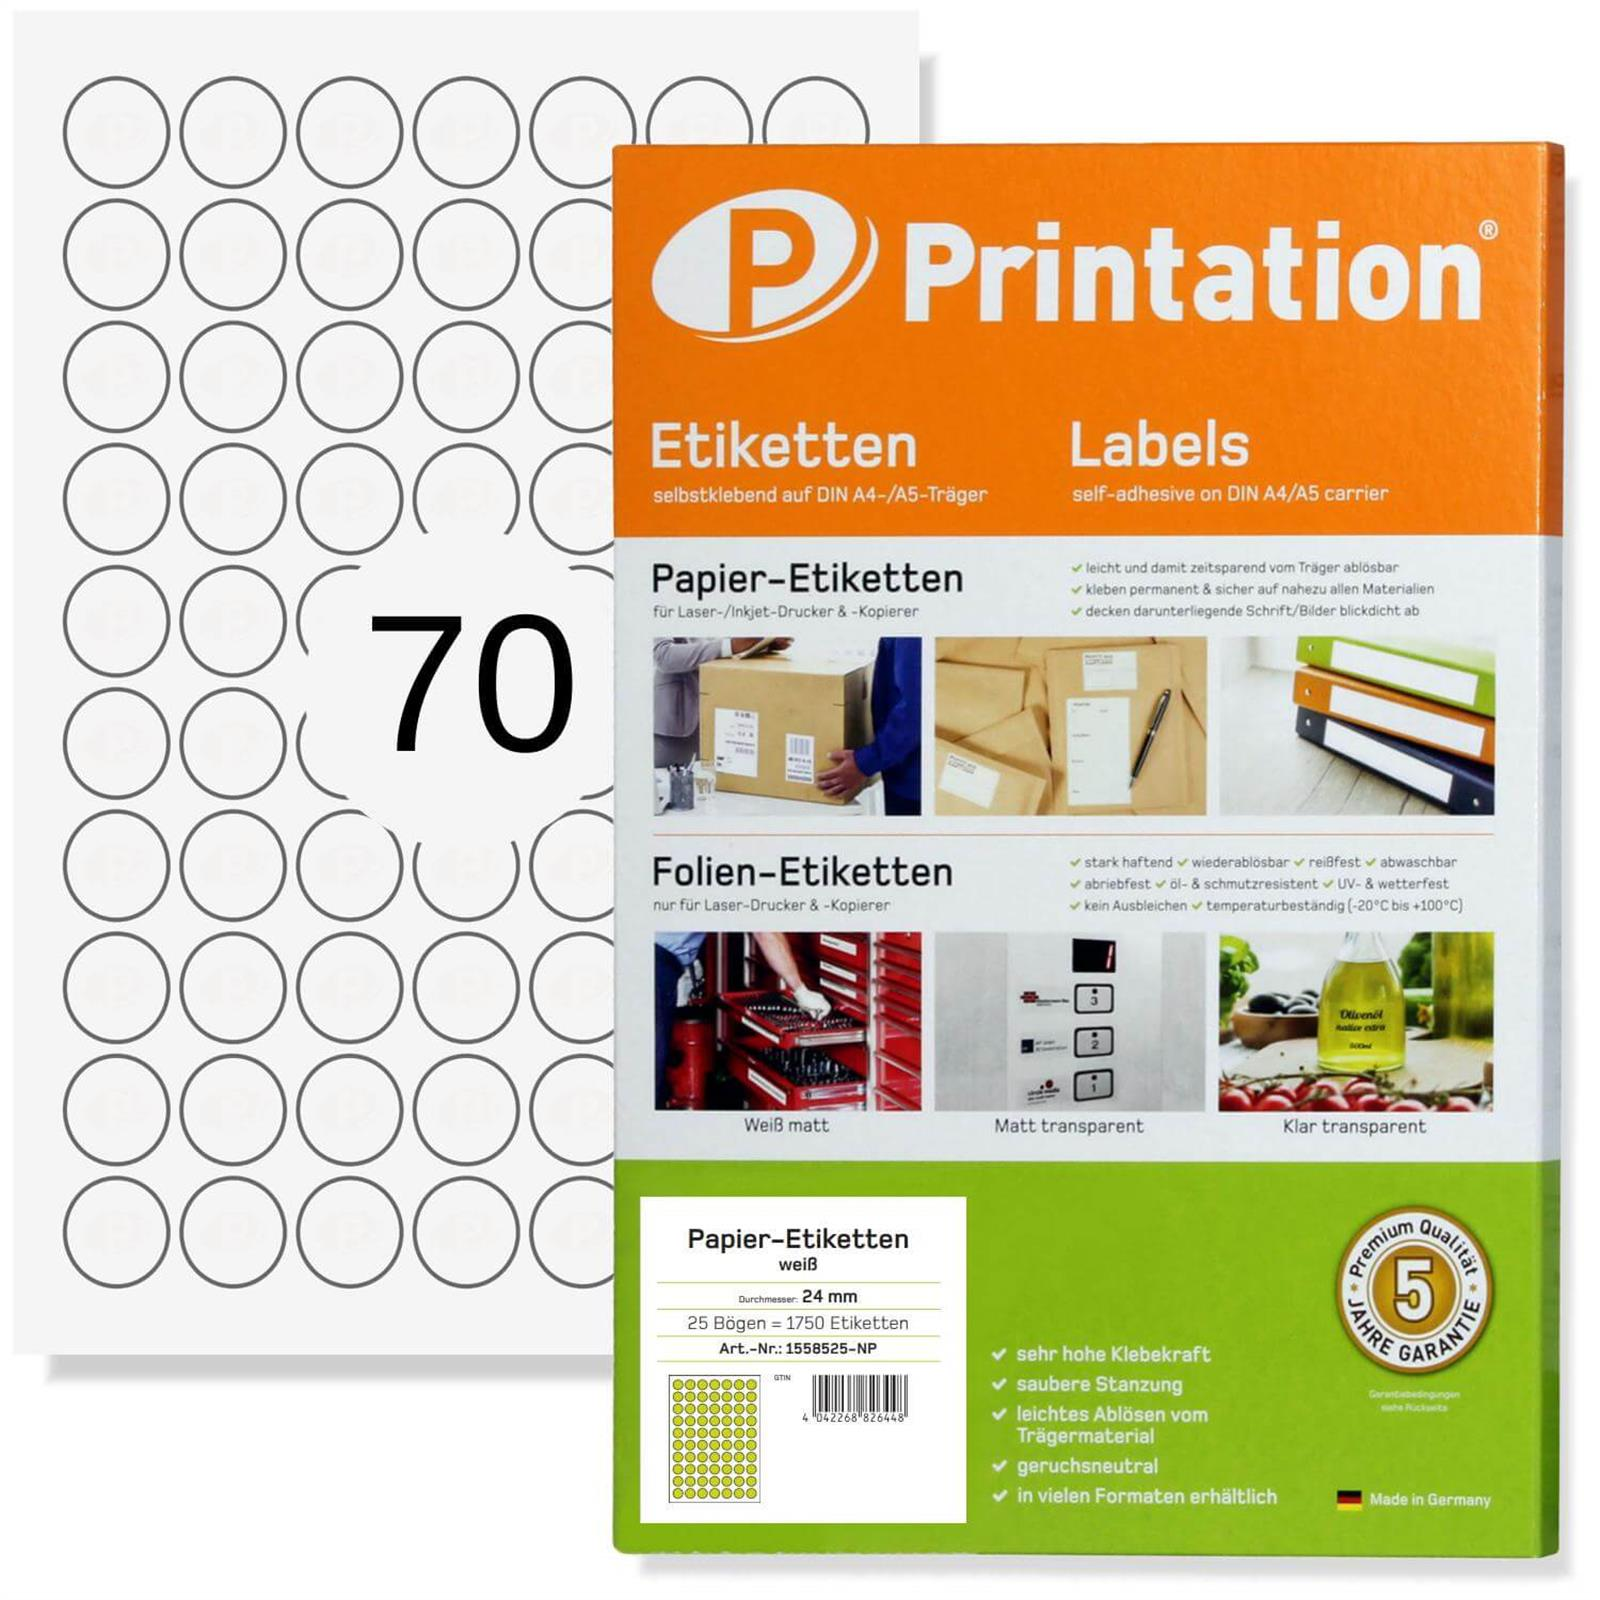 52,5x29,6 4000 Etiketten 100 Blatt DIN A4 Größe